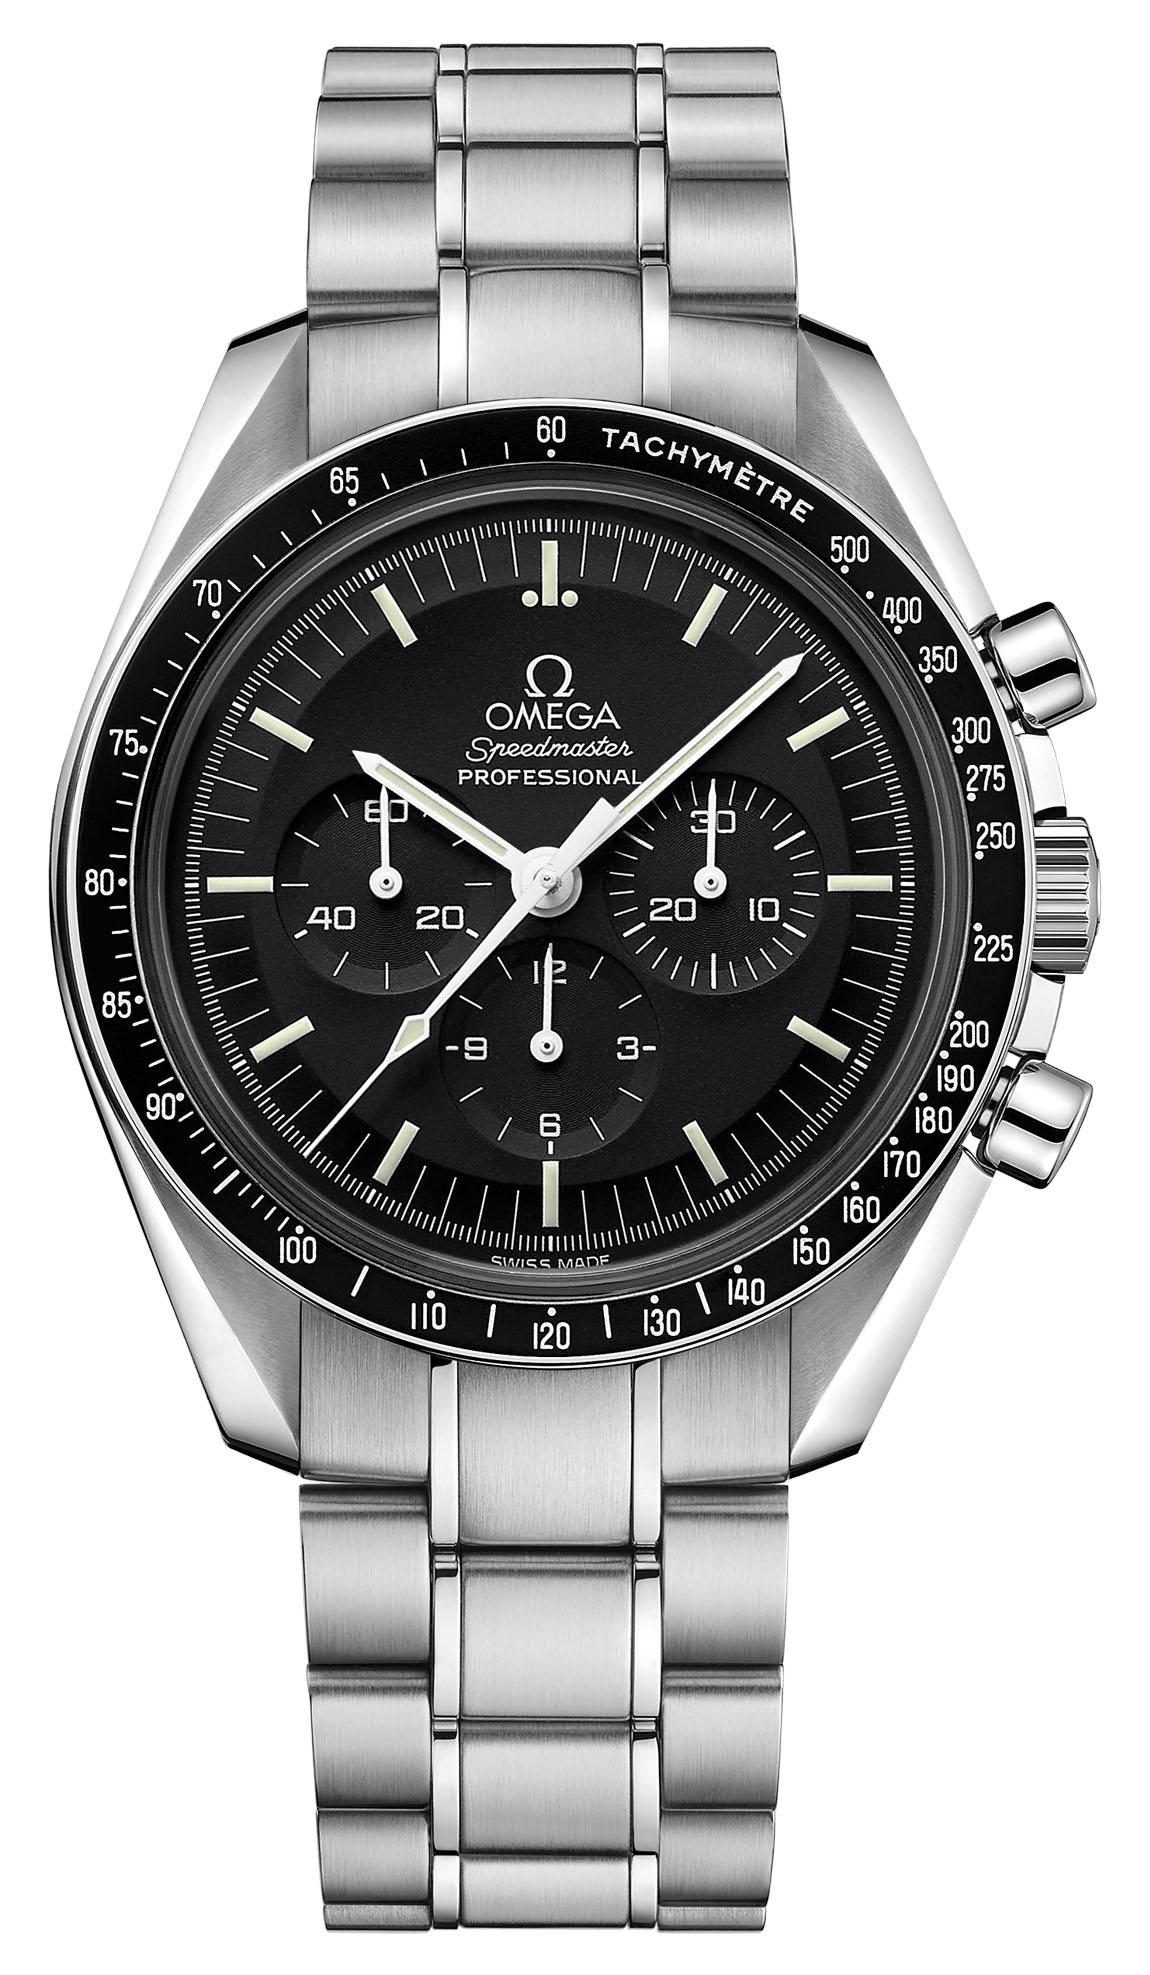 Omega Speedmaster Moonwatch Professional - pre-2021 Calibre 1861 steel on steel hesalite 311.30.42.30.01.005